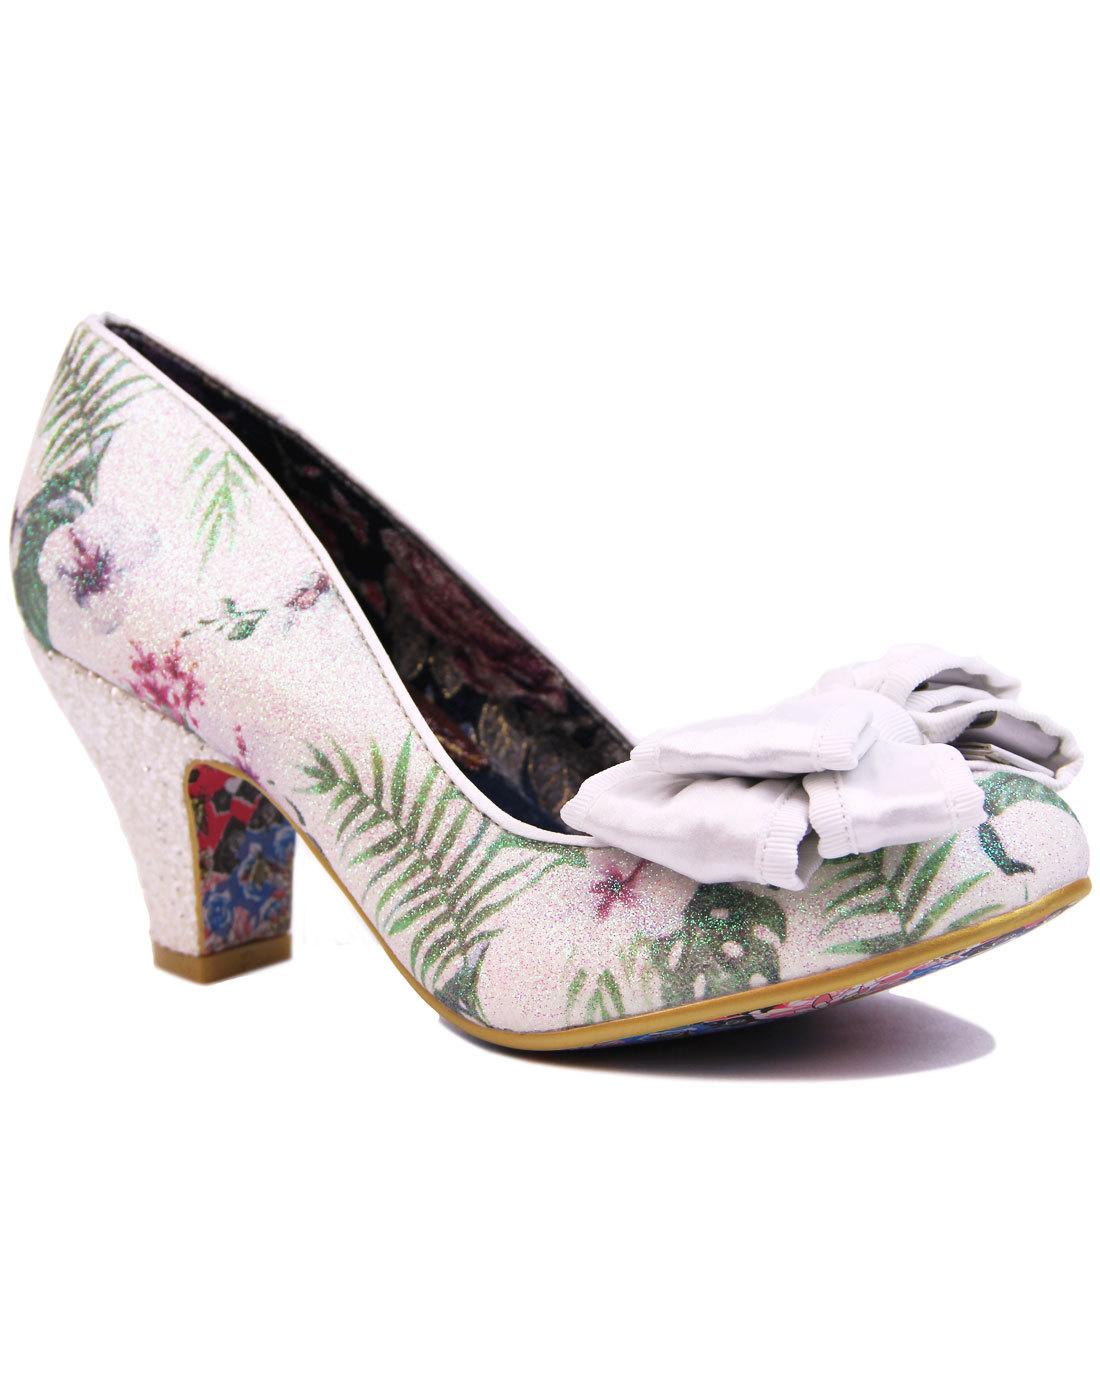 Ban Joe IRREGULAR CHOICE Retro White Floral Heels